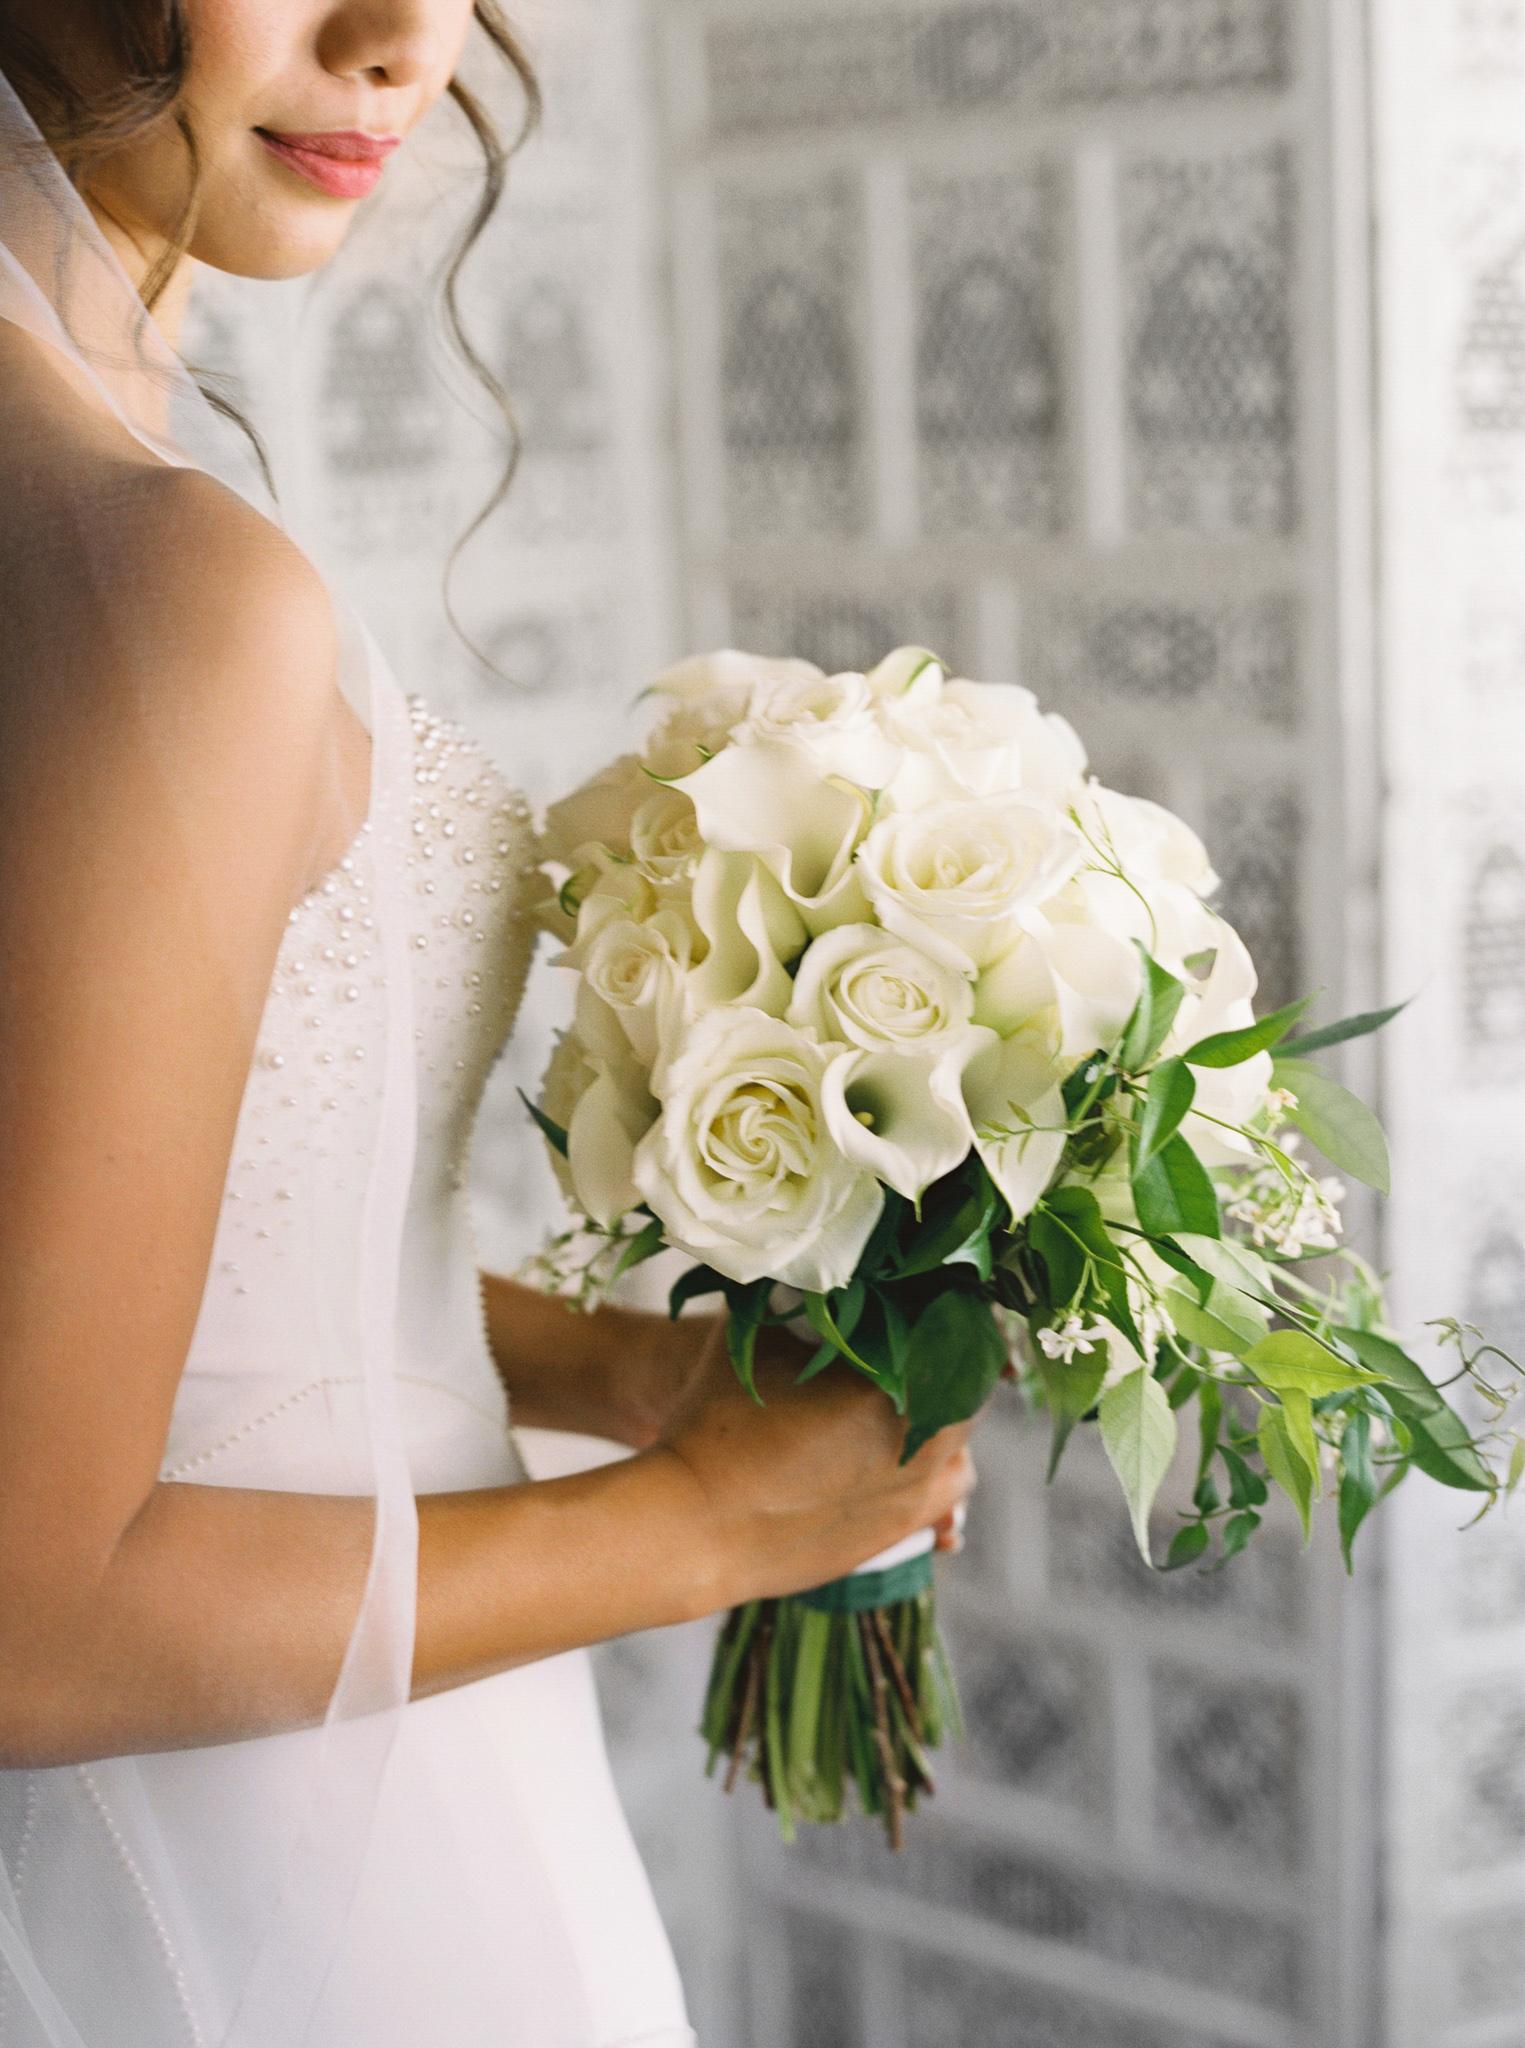 018OutliveCreative_Travel_Photographer_Videographer_Lewis&Clark_Oregon_Elegant_BlackTie_Destination_Wedding.jpg